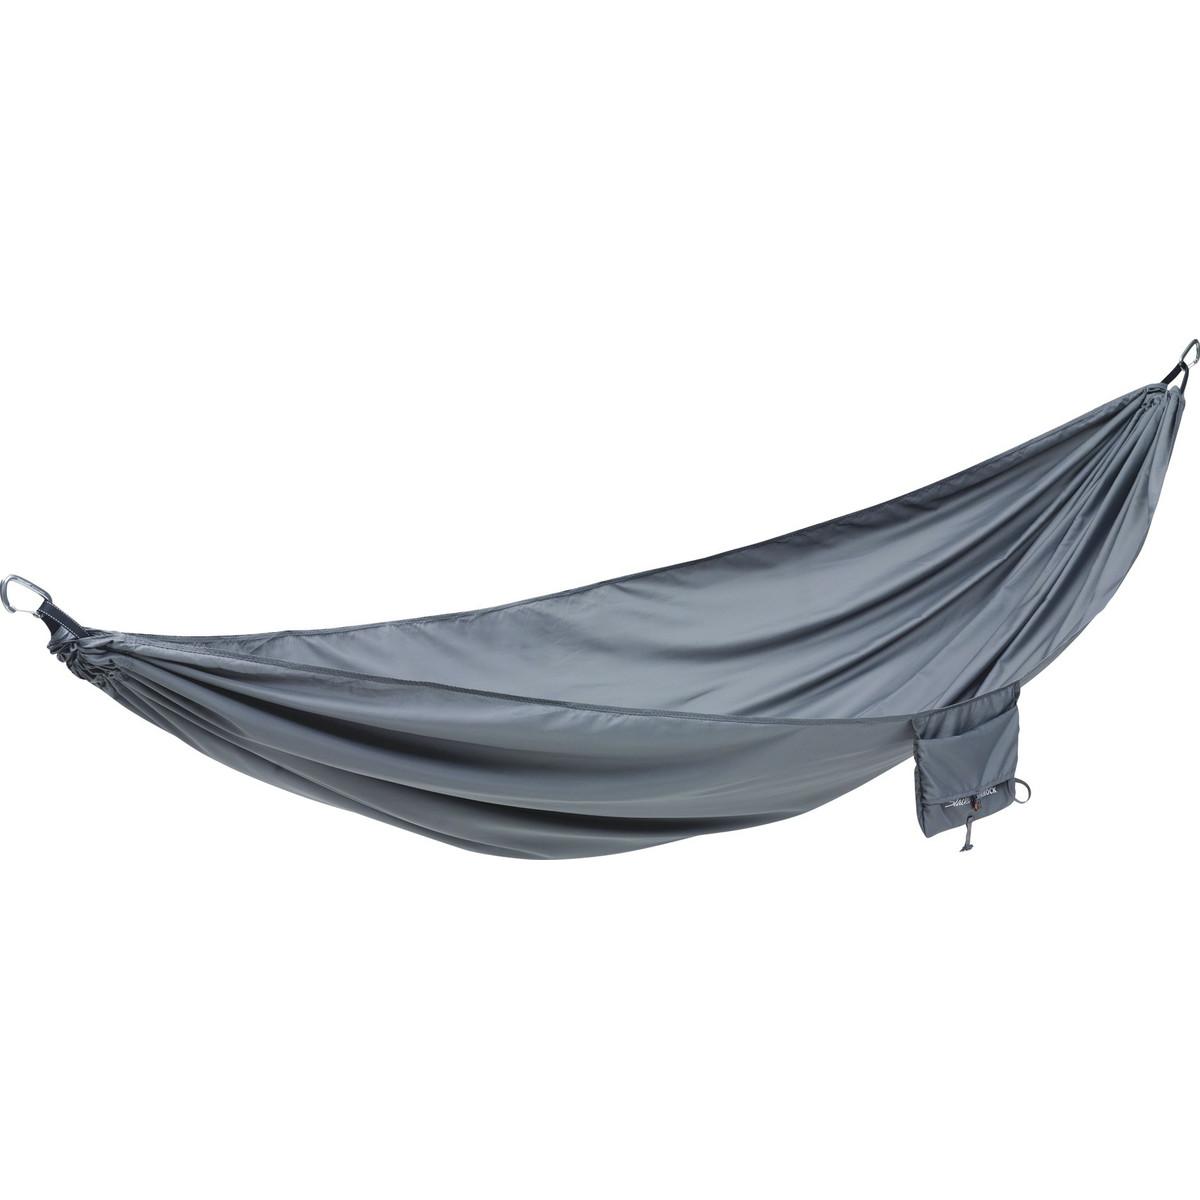 Therm-a-Rest Slacker Single Hammock